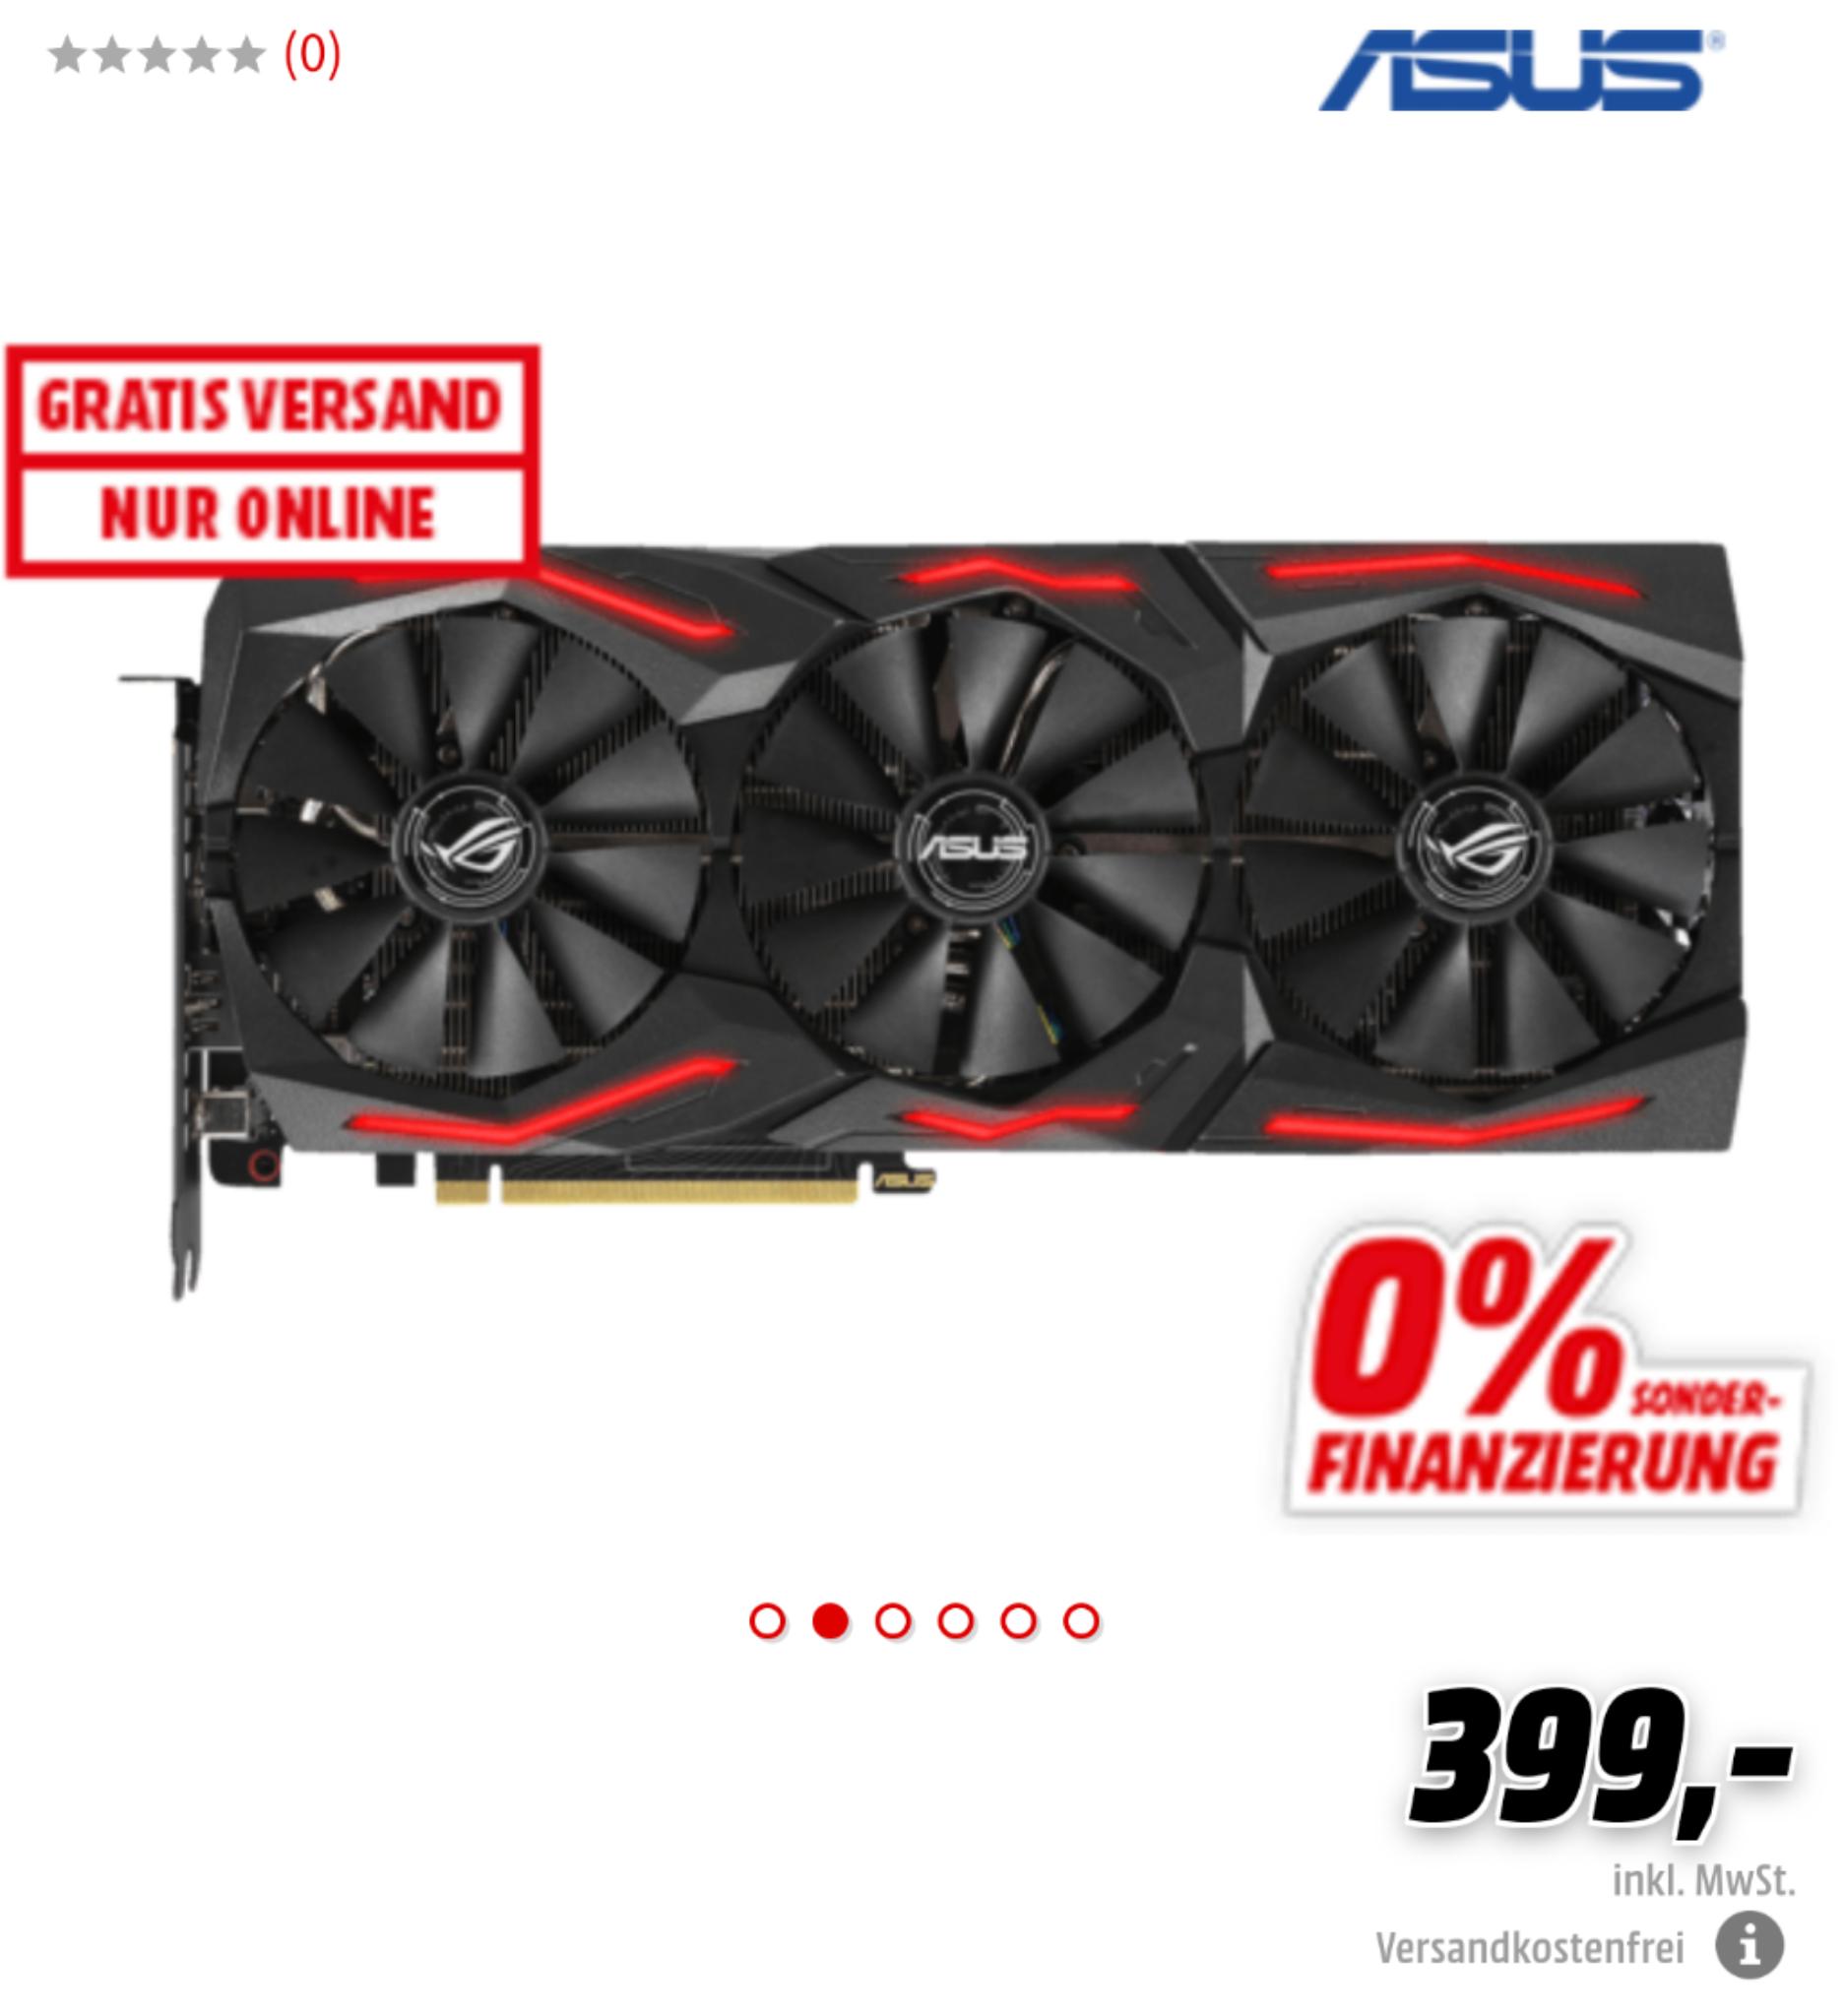 ASUS Grafikkarte ROG STRIX RTX2060S A8G GAMING 8GB [Mediamarkt]